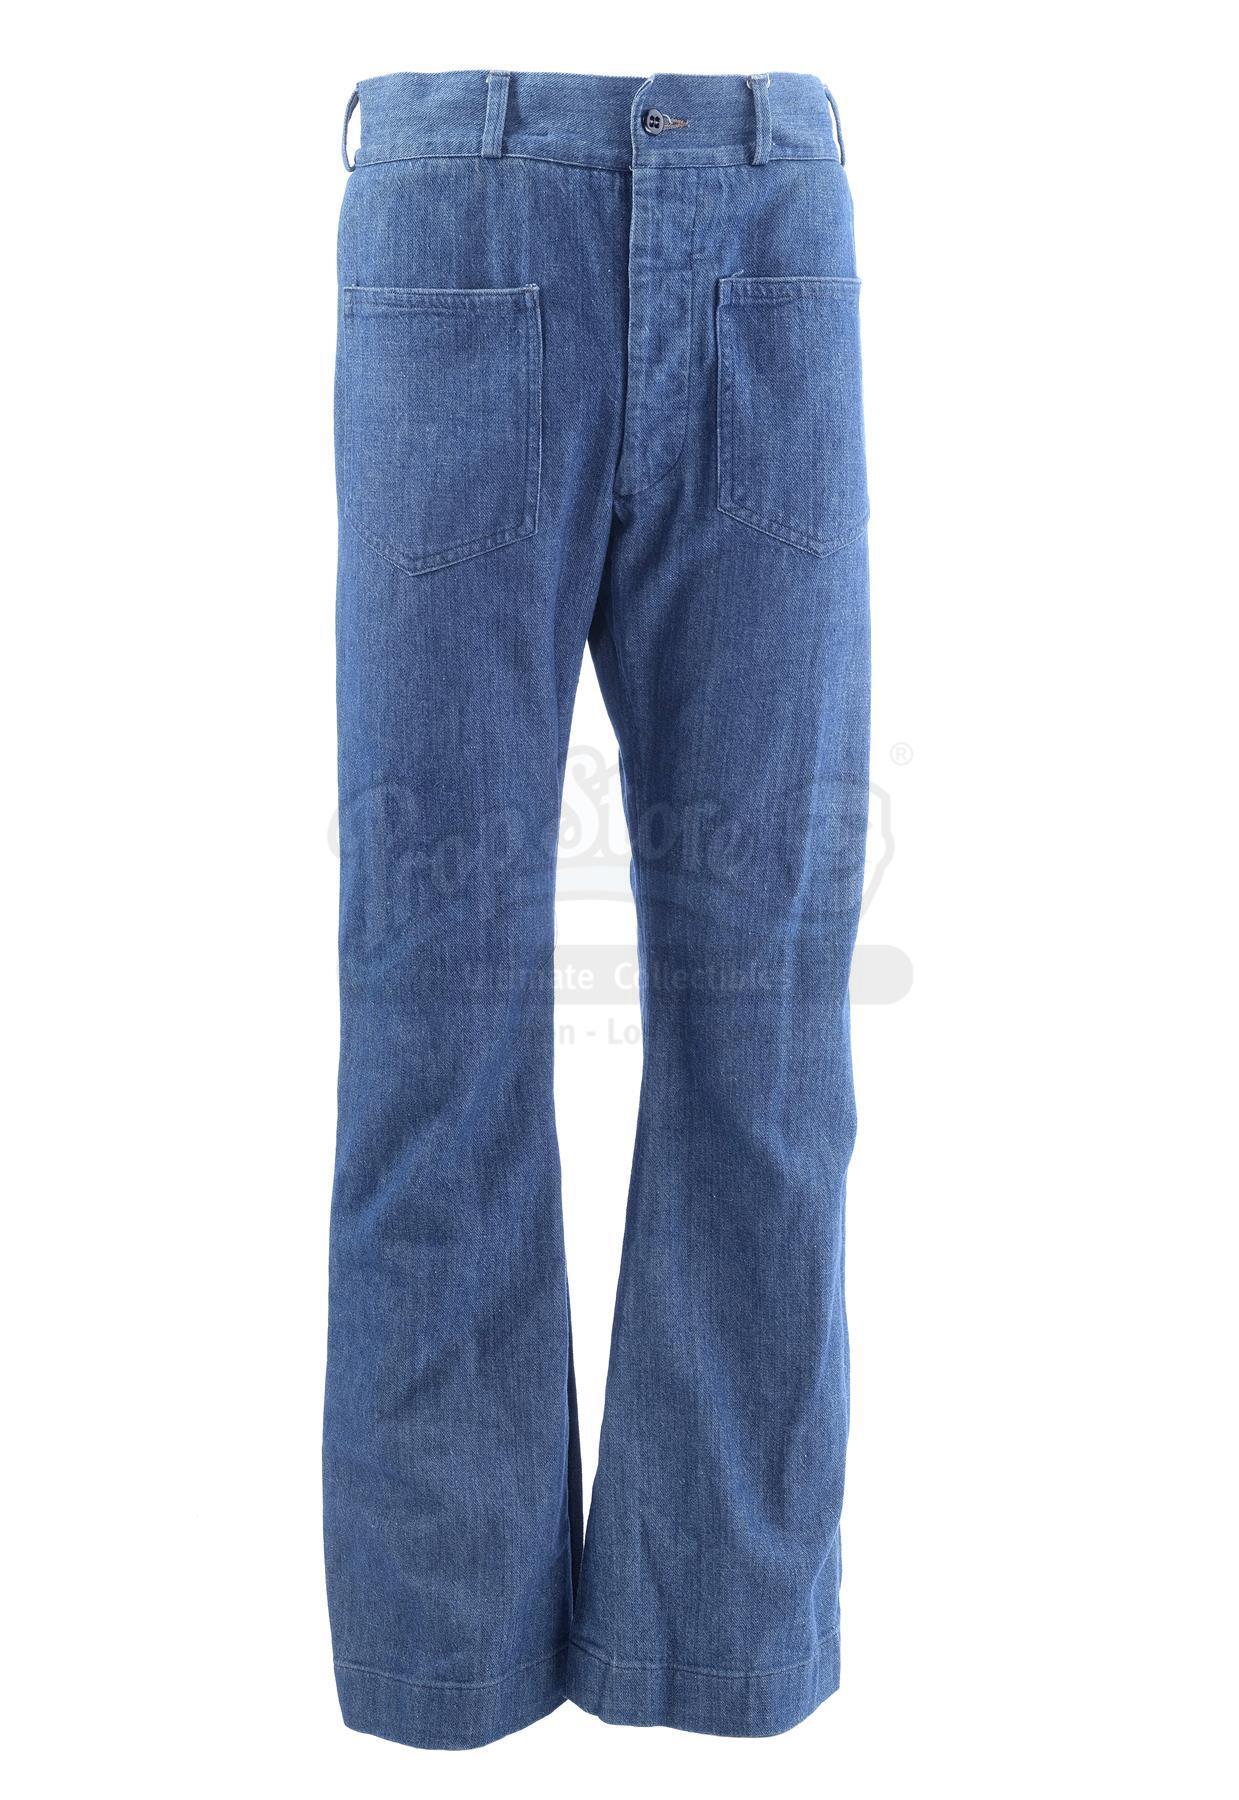 Lot # 1005: THE SAND PEBBLES - Jake Holman's (Steve McQueen) Jeans